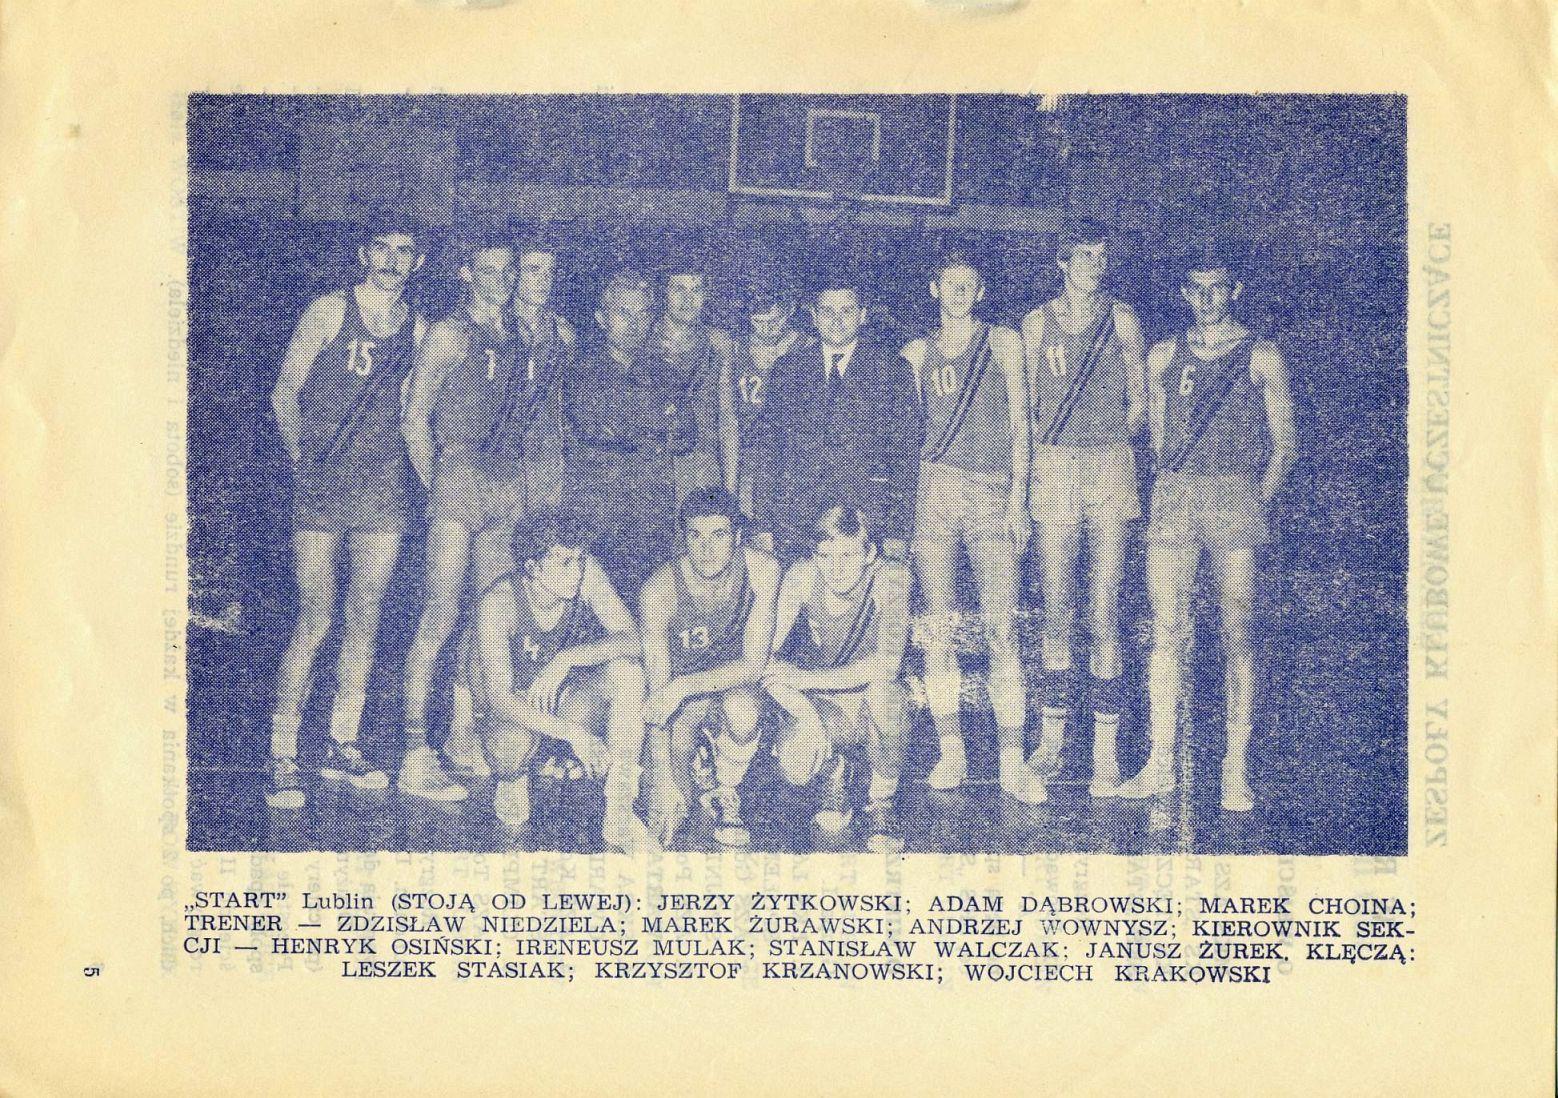 Z archiwum Centrum Historii Sportu: Program KS Start Lublin z sezonu 1972/1973